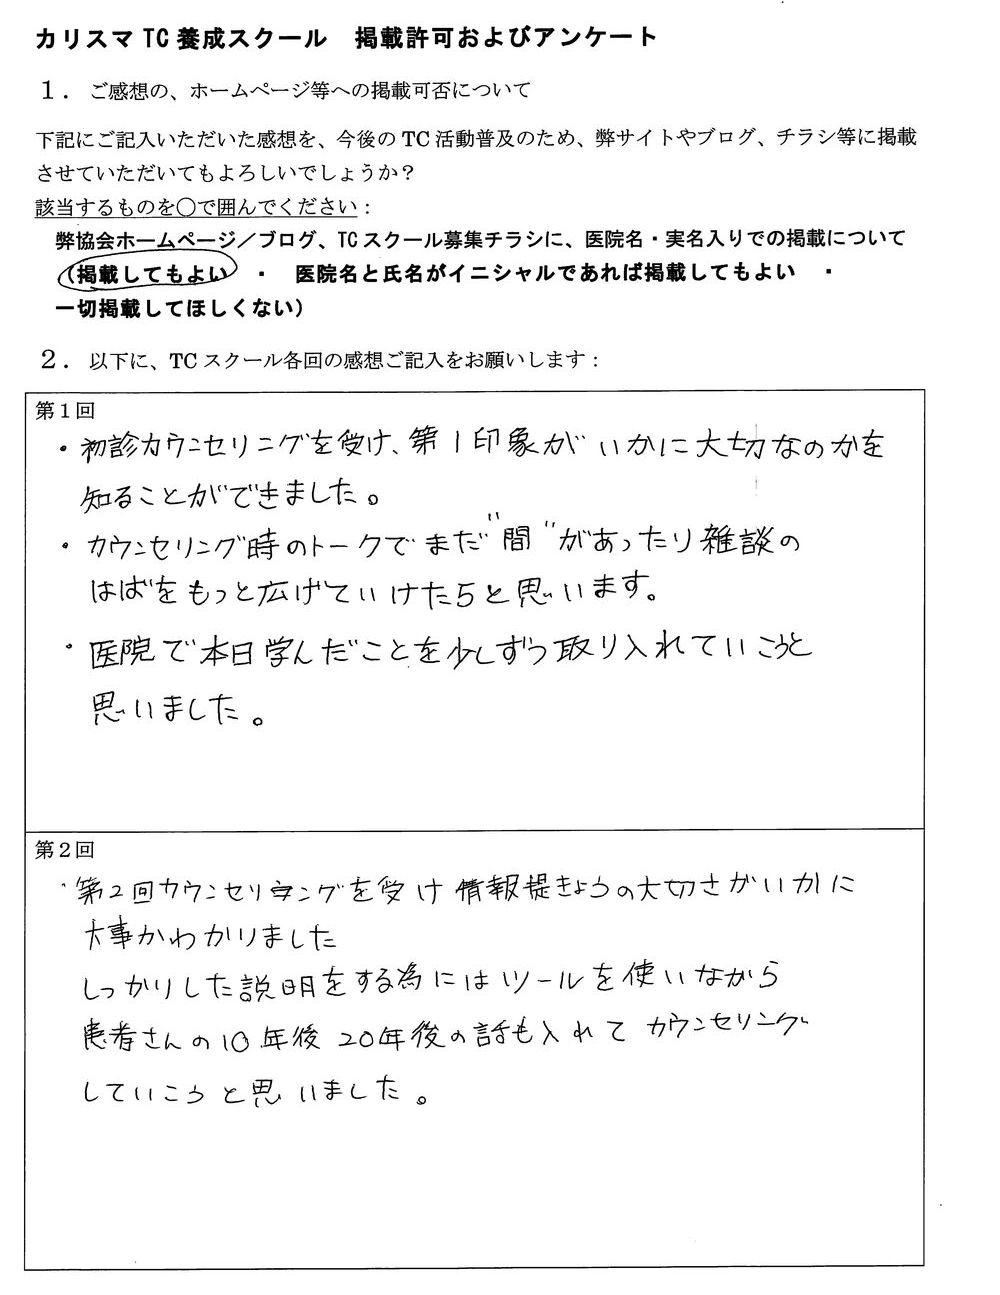 三浦歯科医院 貴島 里恵様アンケート